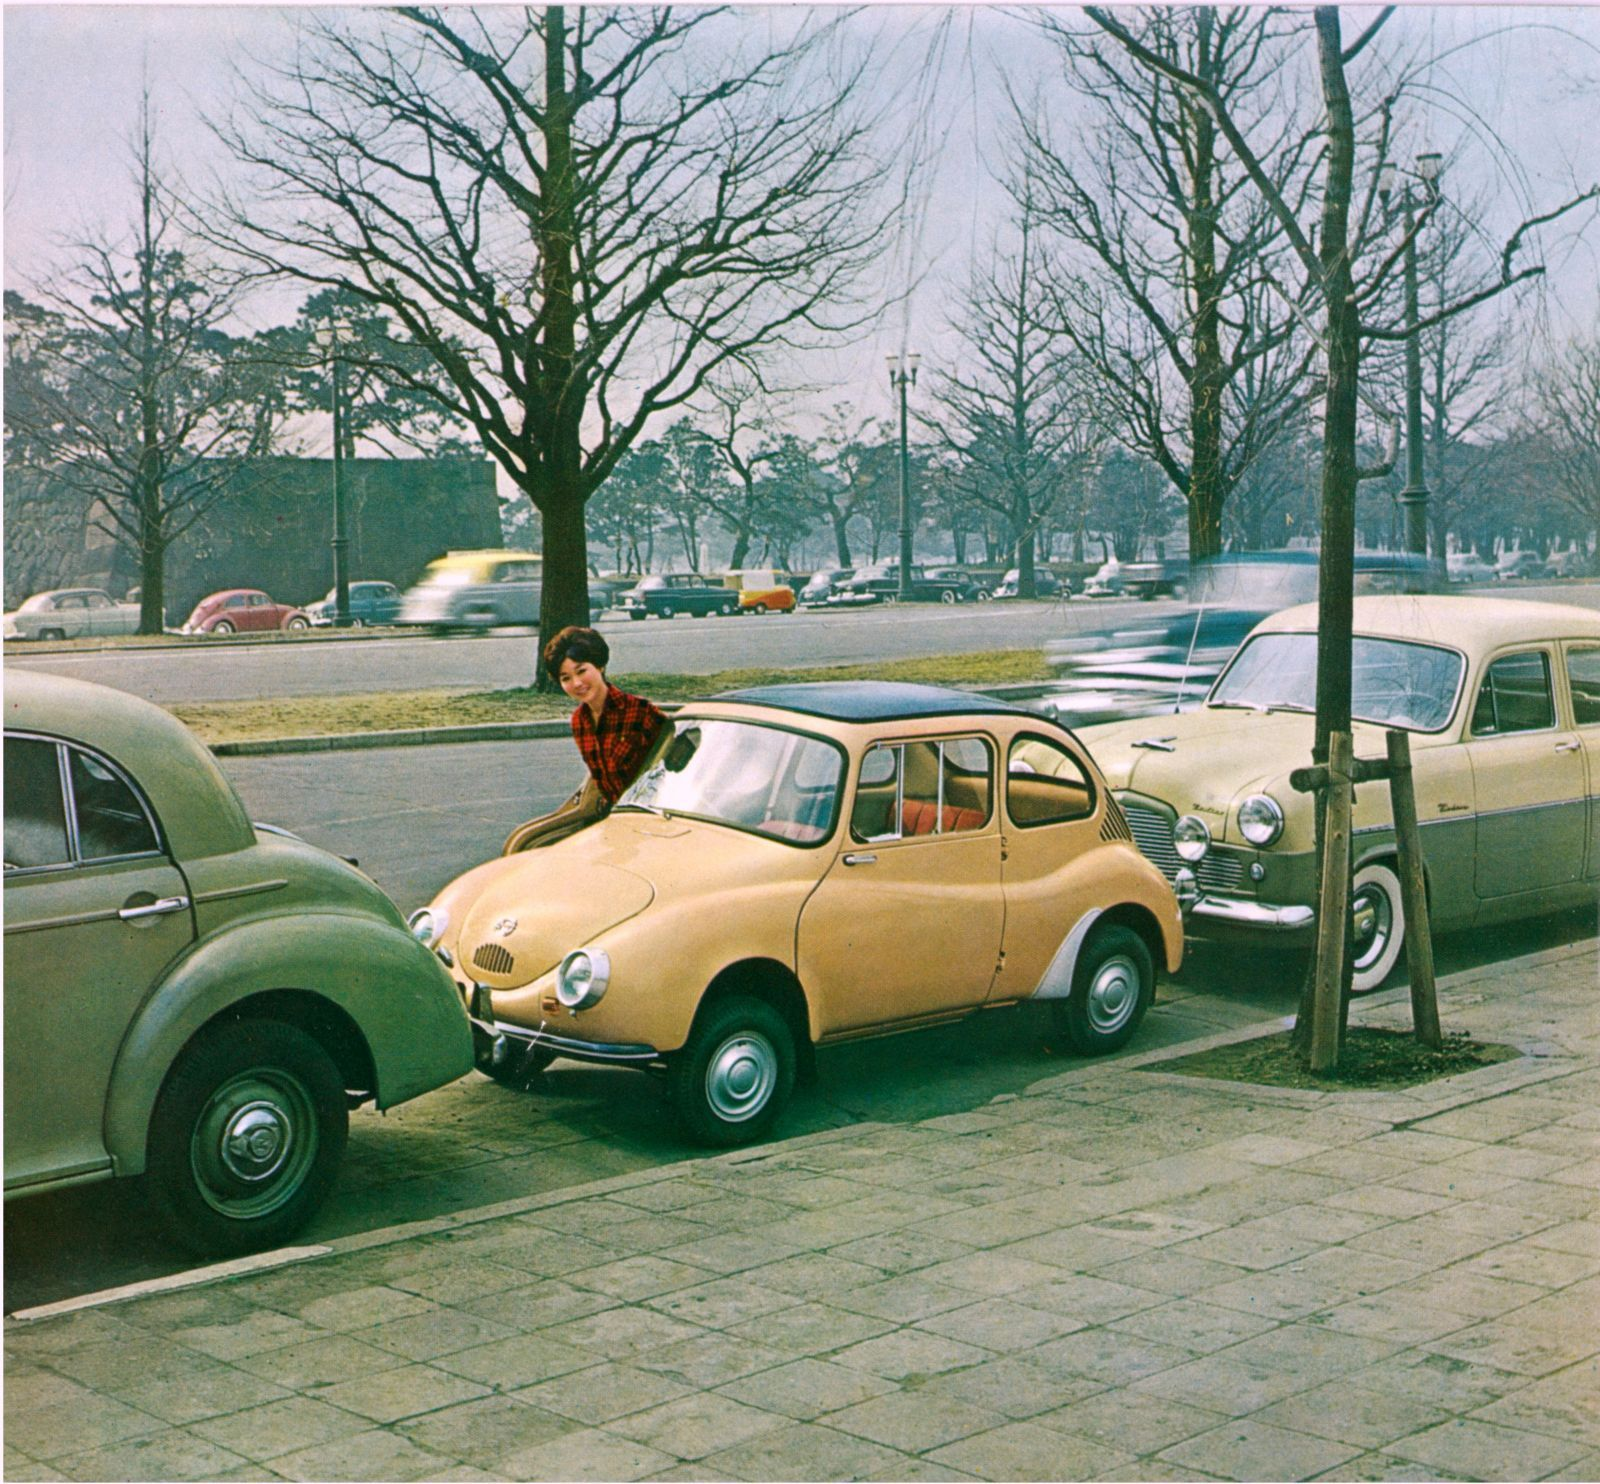 Subaru 360 1958 1971 1950s car pinterest subaru cars and subaru 360 1958 1971 vanachro Image collections